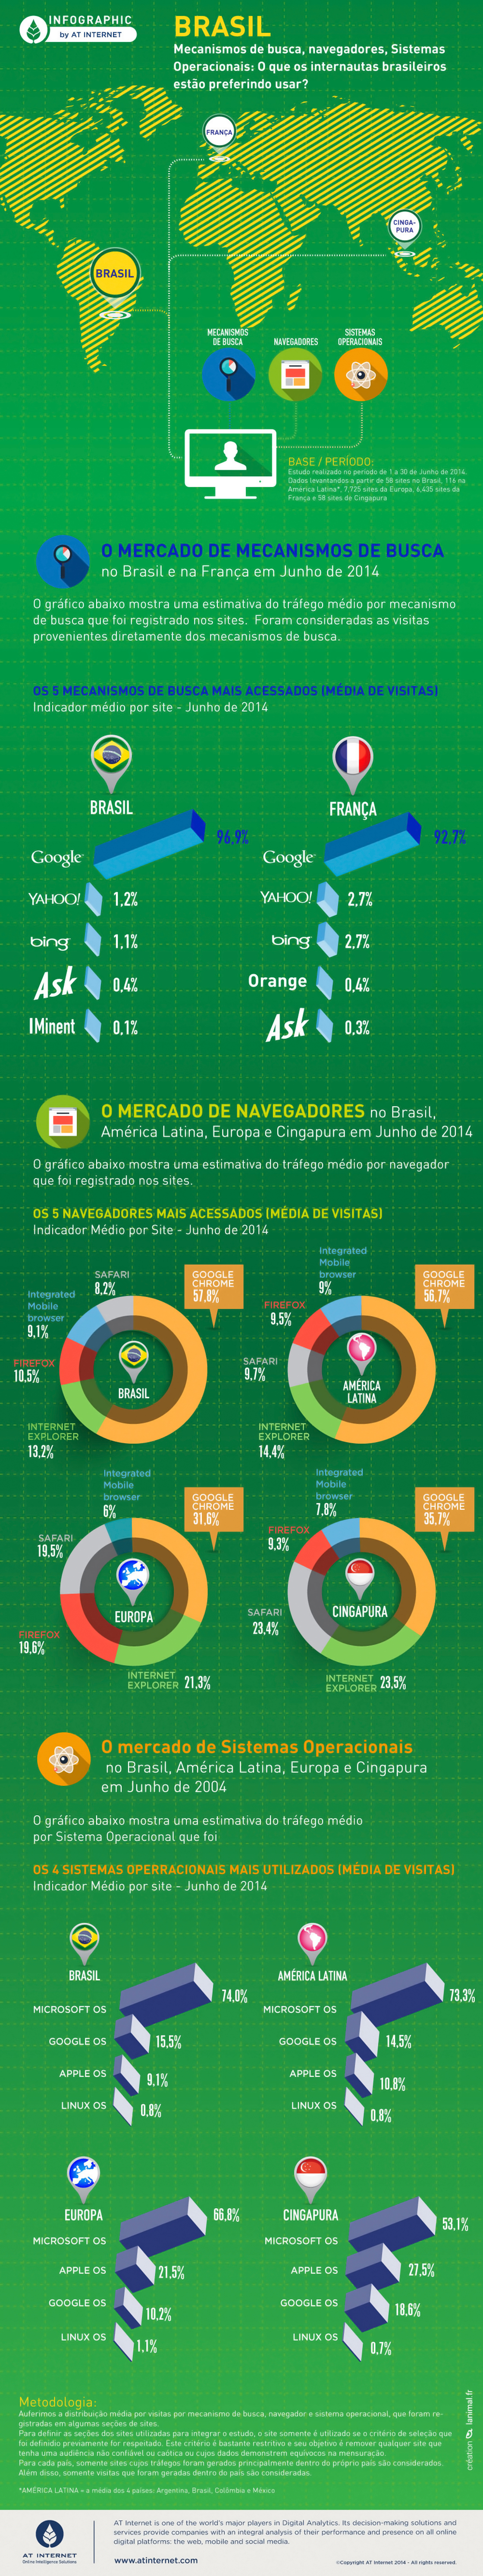 Infográfico mostra comportamento dos brasileiros na internet